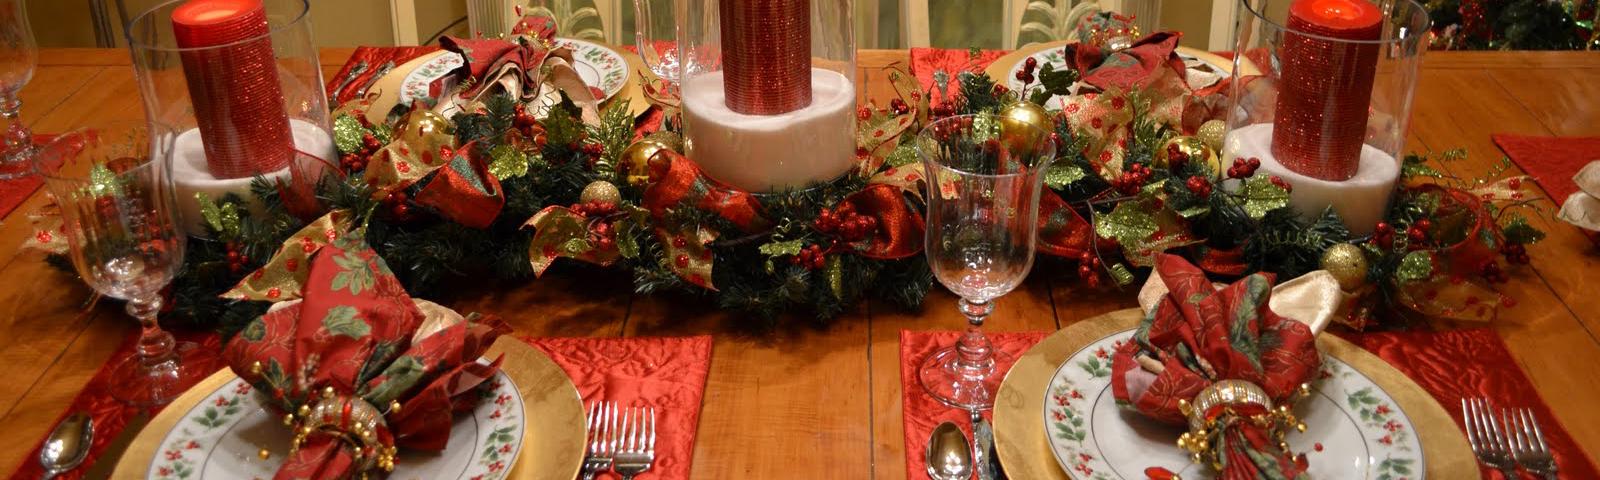 украшения стола на рождество фото